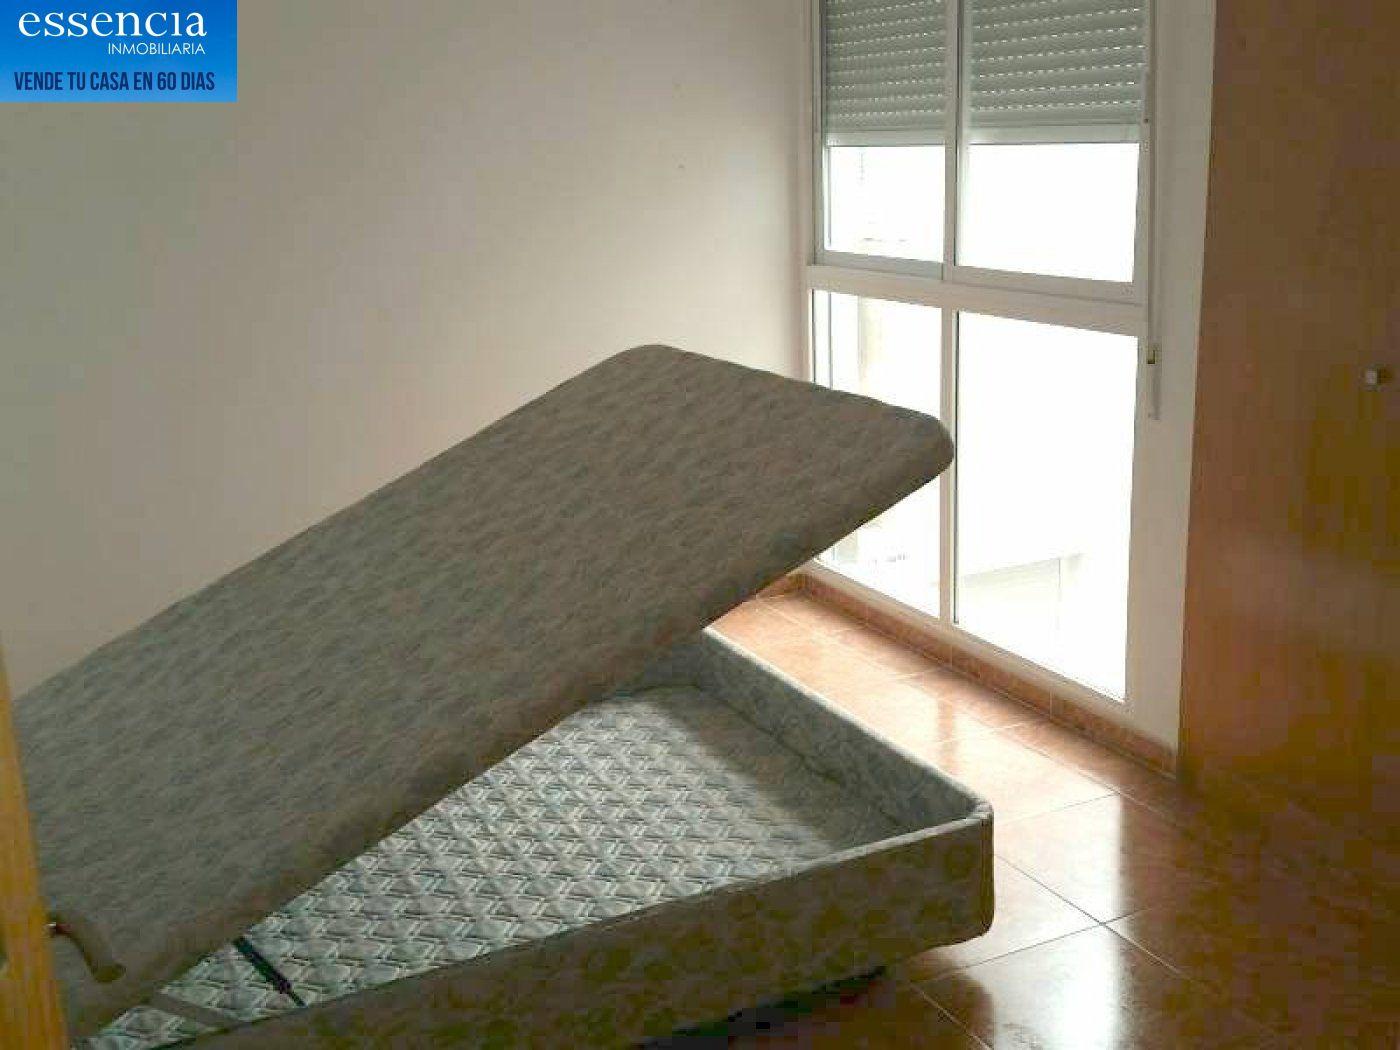 Oferta sin visitar. piso en oliva con ascensor, calle isaac albeniz - imagenInmueble21